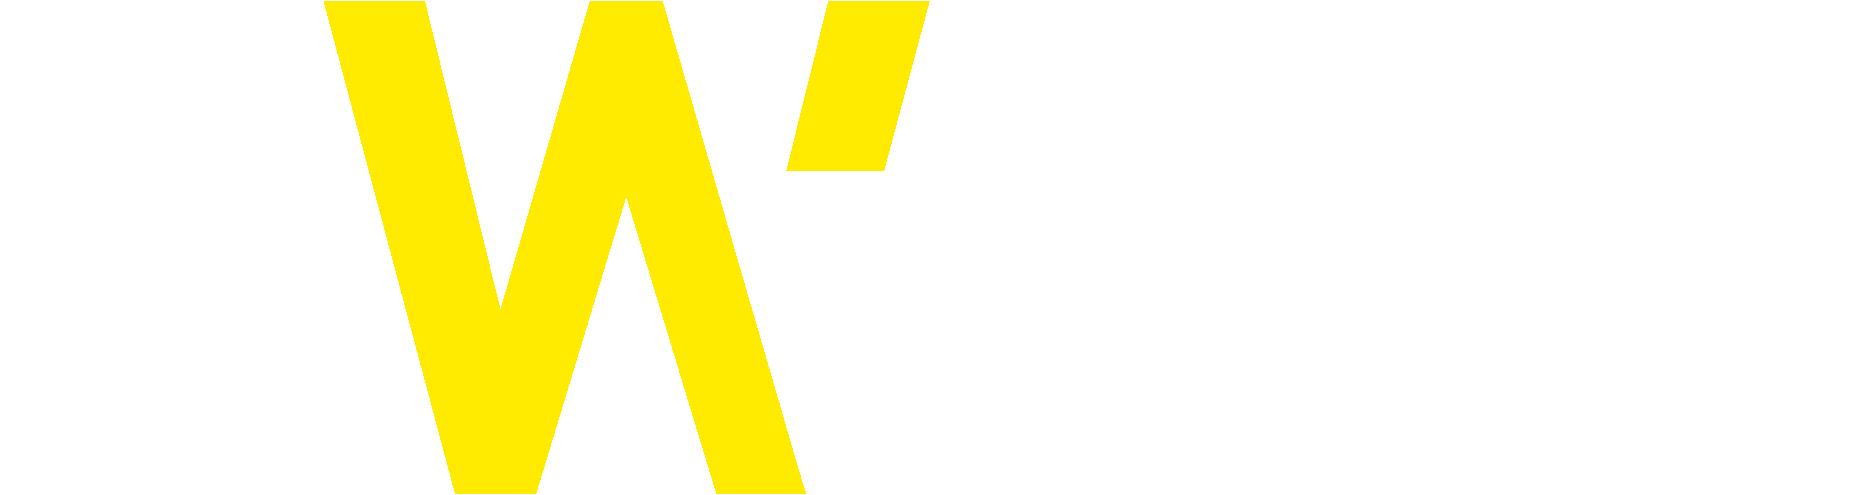 Logo Awalp Studio agence marketing digital et content